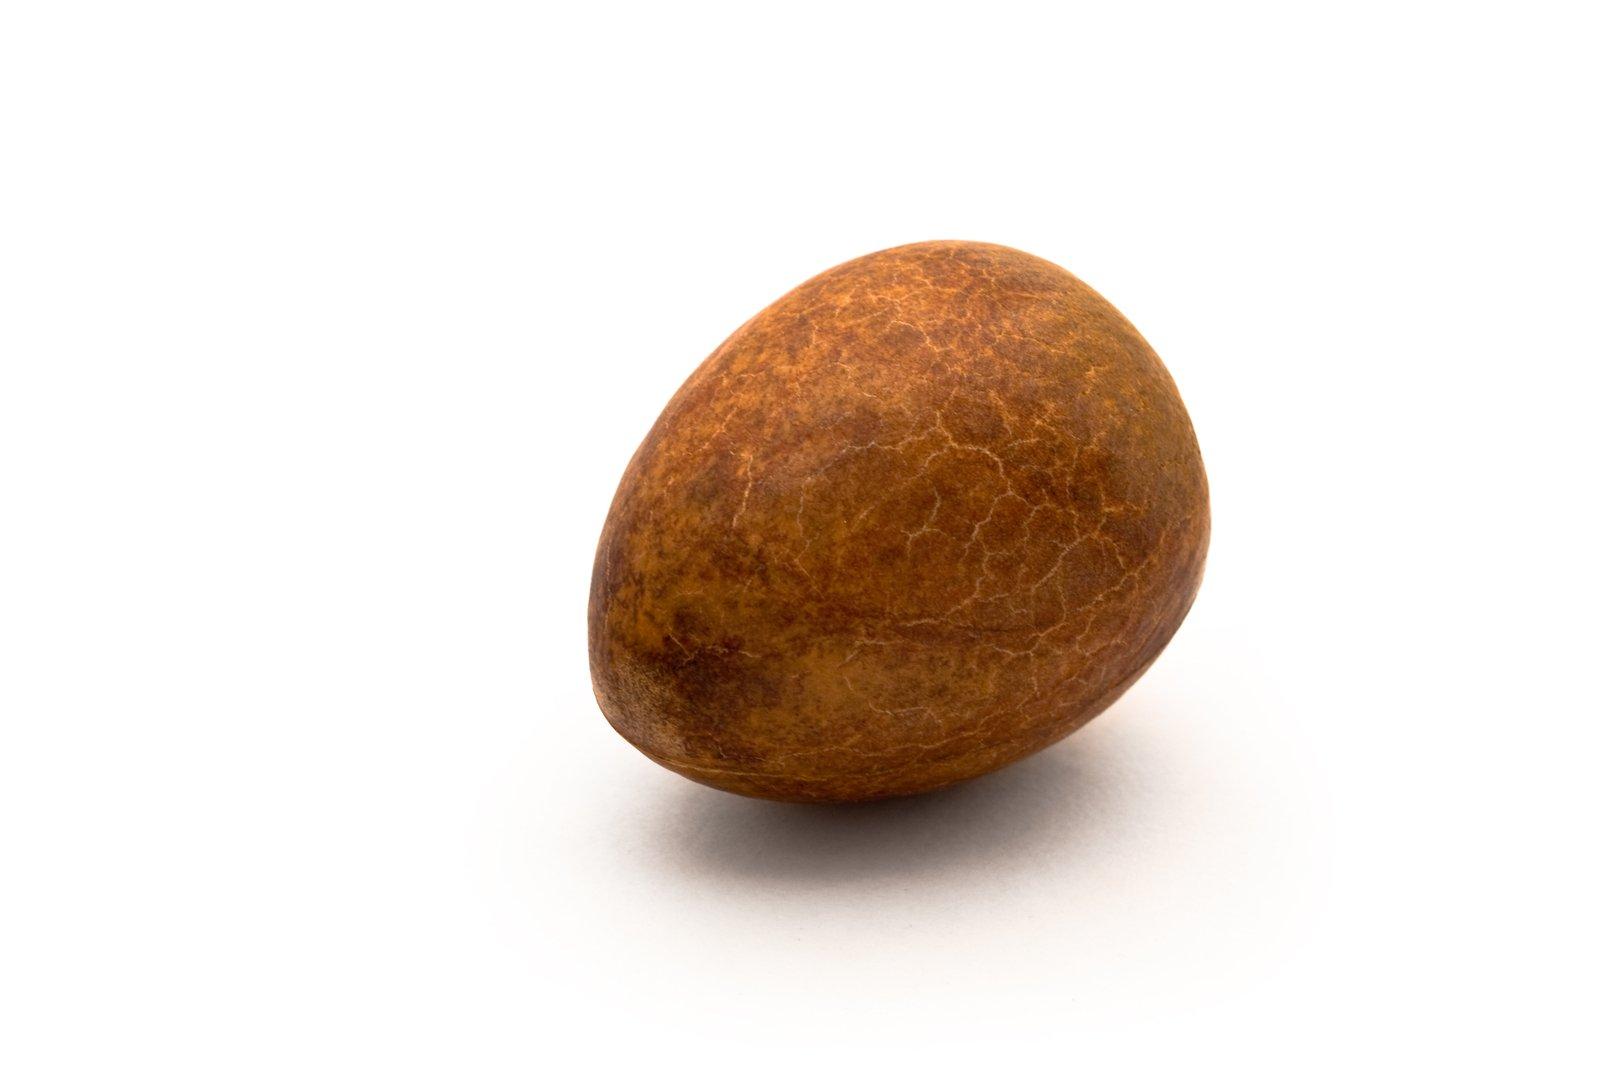 free avocado seed 2 stock photo